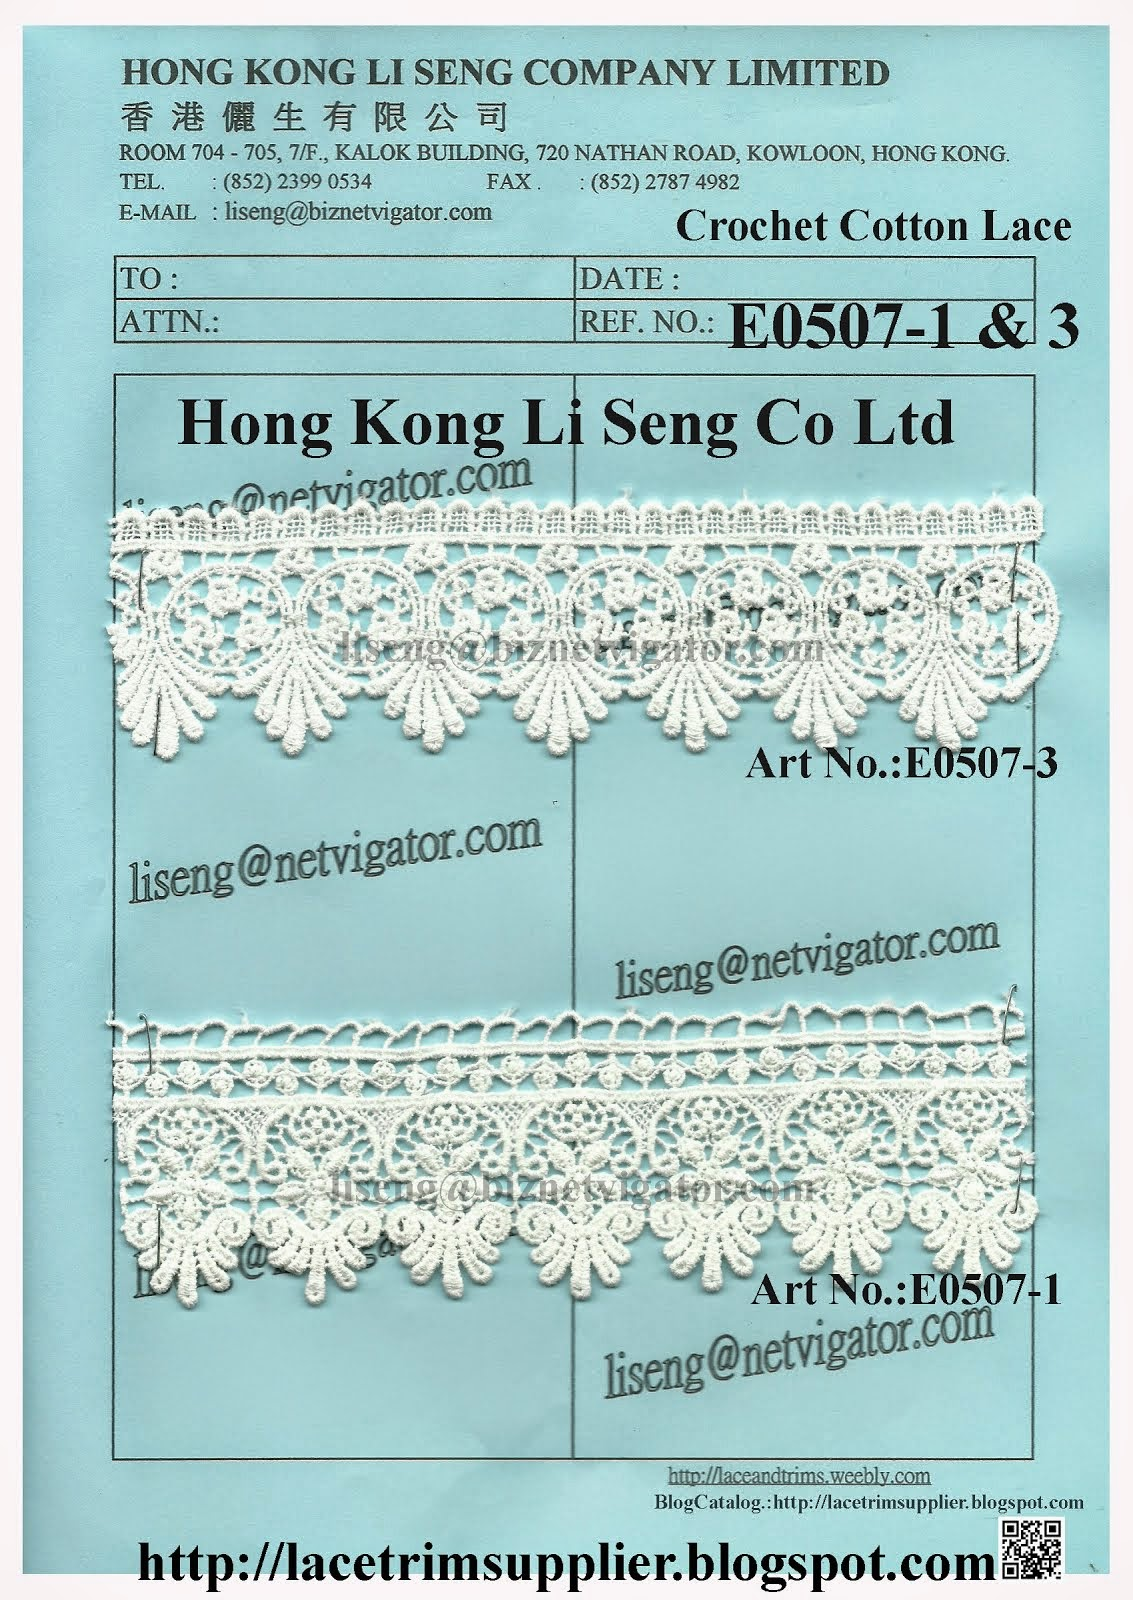 Crochet Cotton Lace Trims Manufacturer and Supplier - Hong Kong Li Seng Co Ltd